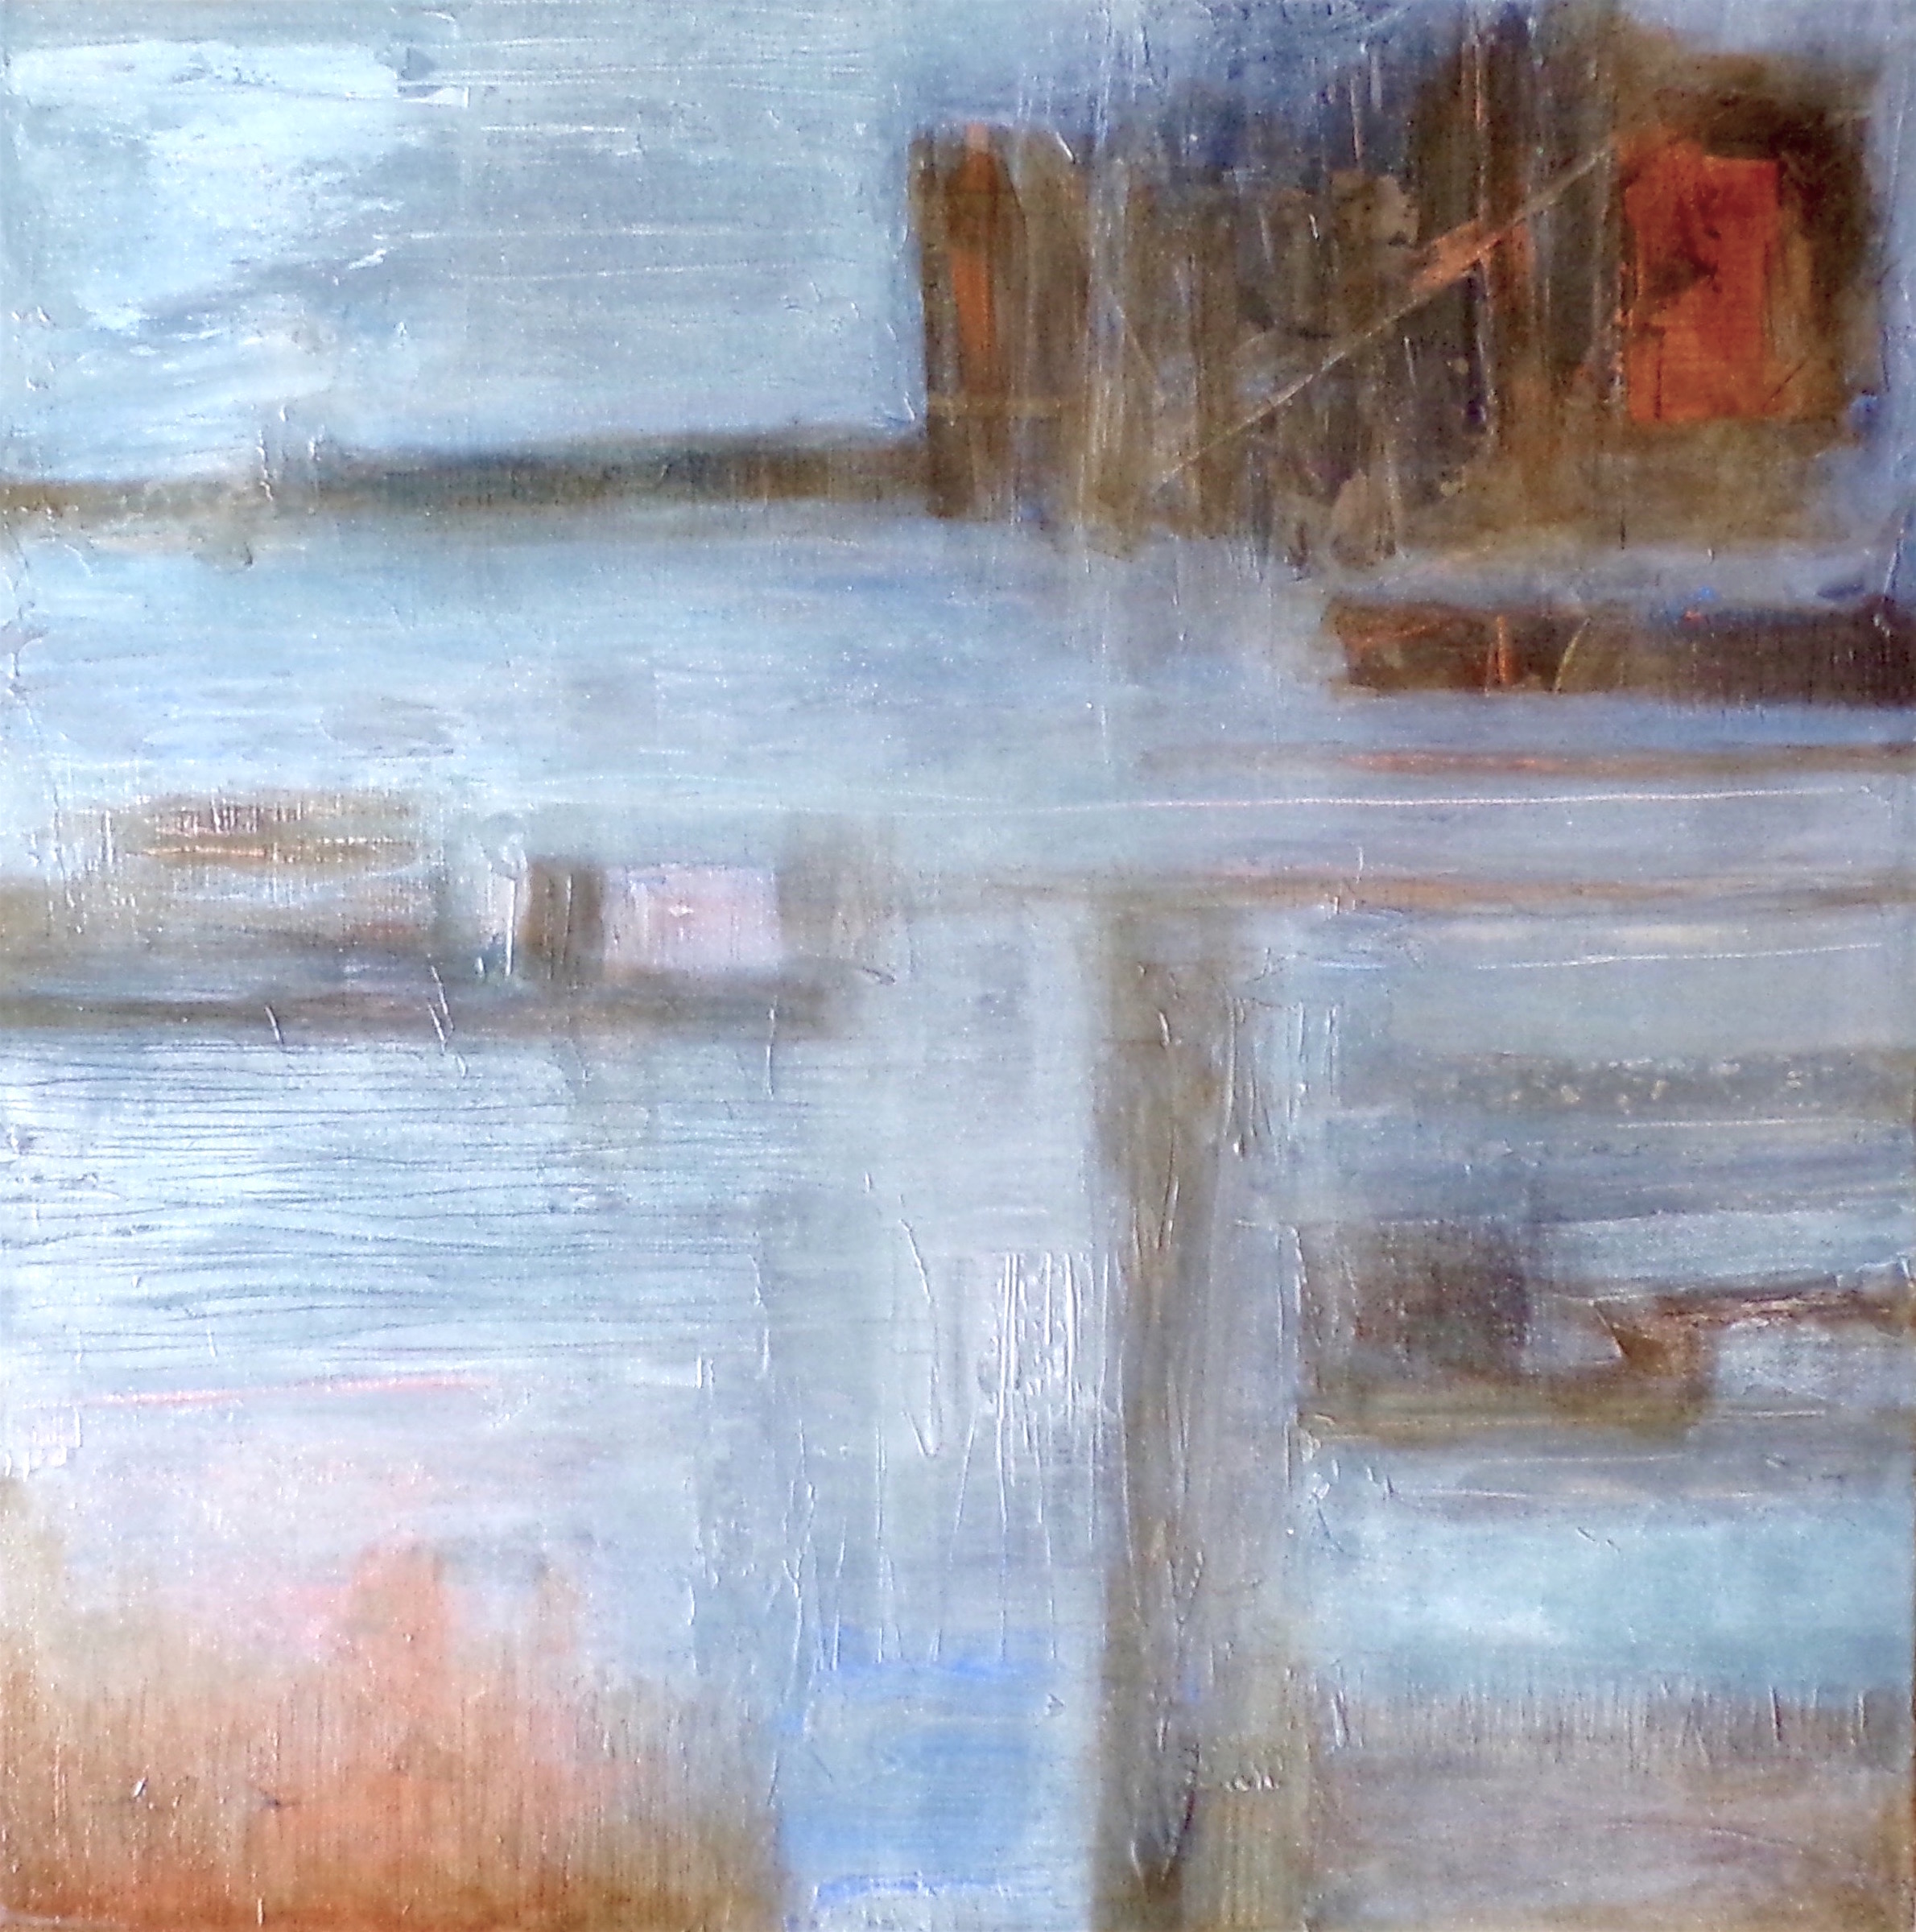 Patricia Mcparlin 'Across the wetlands' mixed media